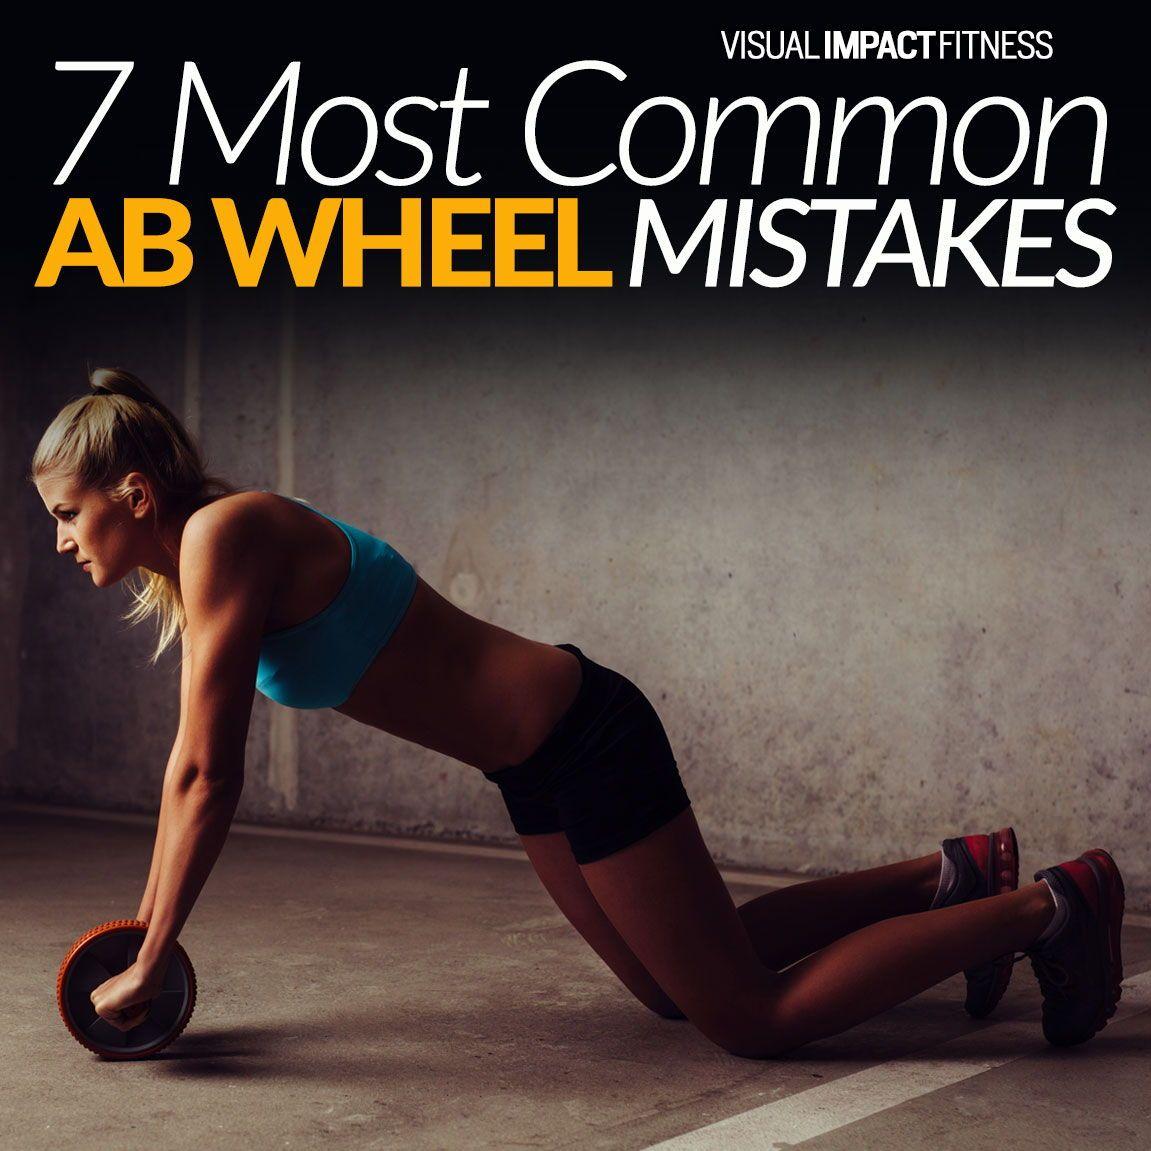 Ab Wheel Mistakes 7 Most Common Ways Workout Plan For Women Workout Plan For Men Ab Wheel Workout